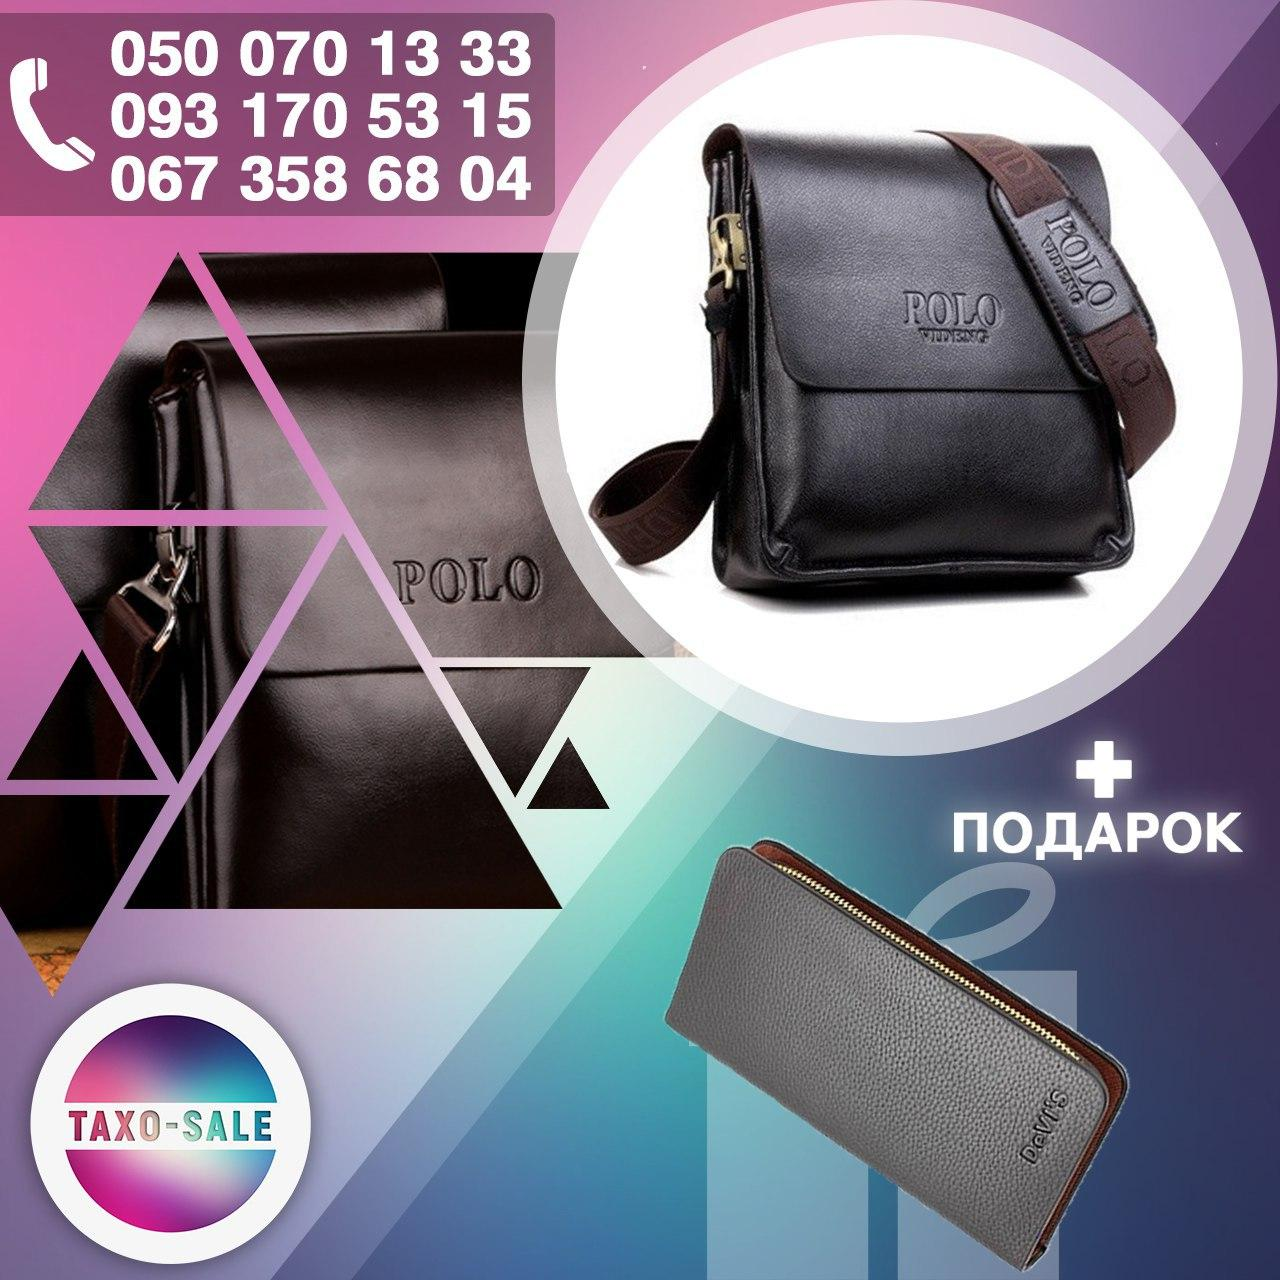 Стильная мужская сумка Polo Videng через плечо fe7352a966b94